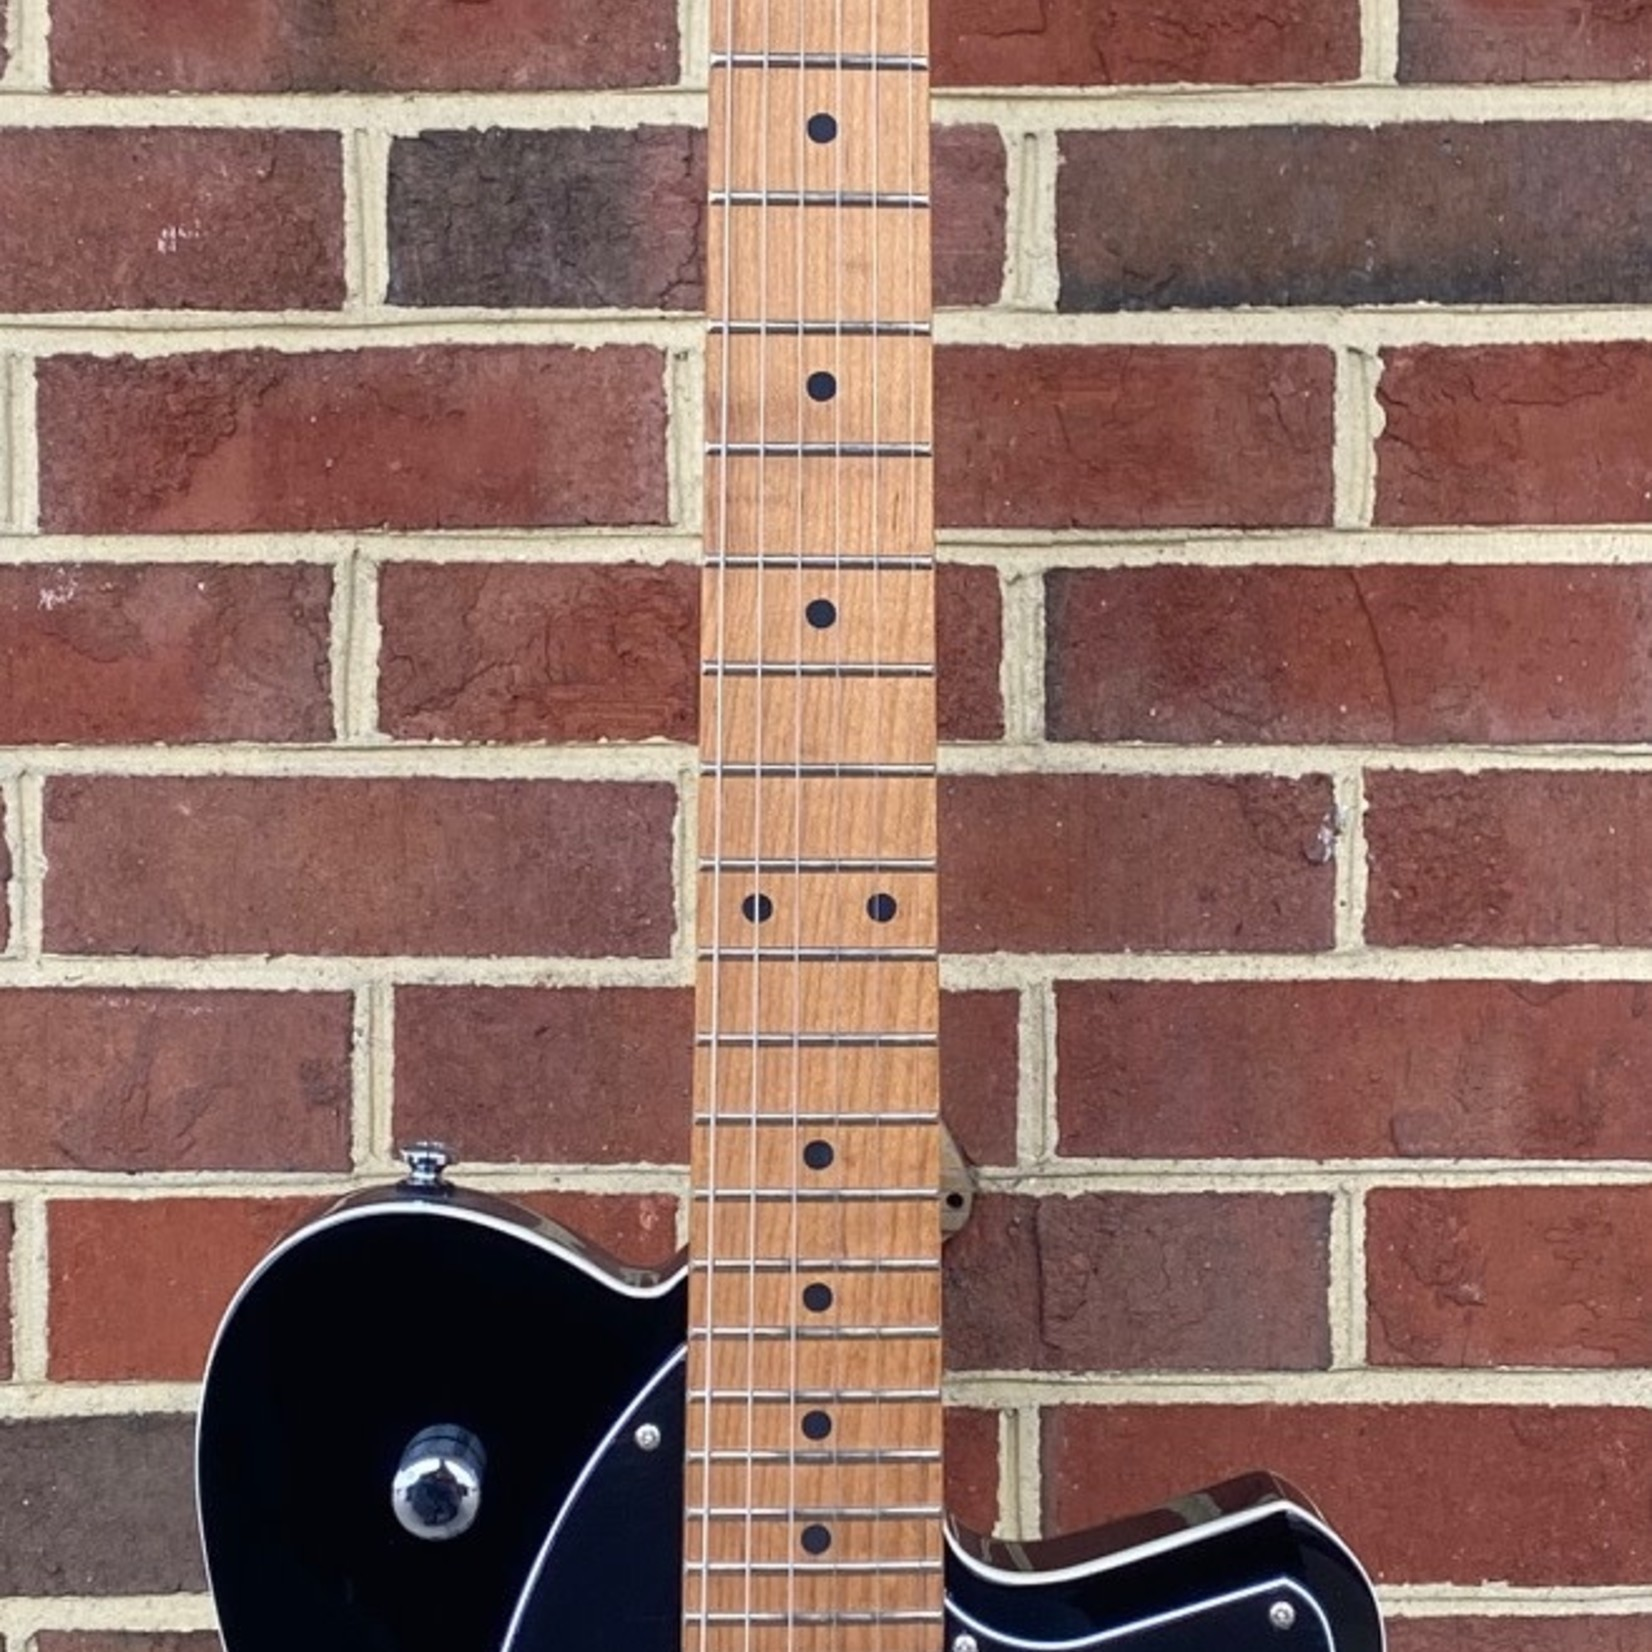 Reverend Reverend Guitars Charger HB, Midnight Black, Roasted Maple Neck, Korina Body, Locking Tuners